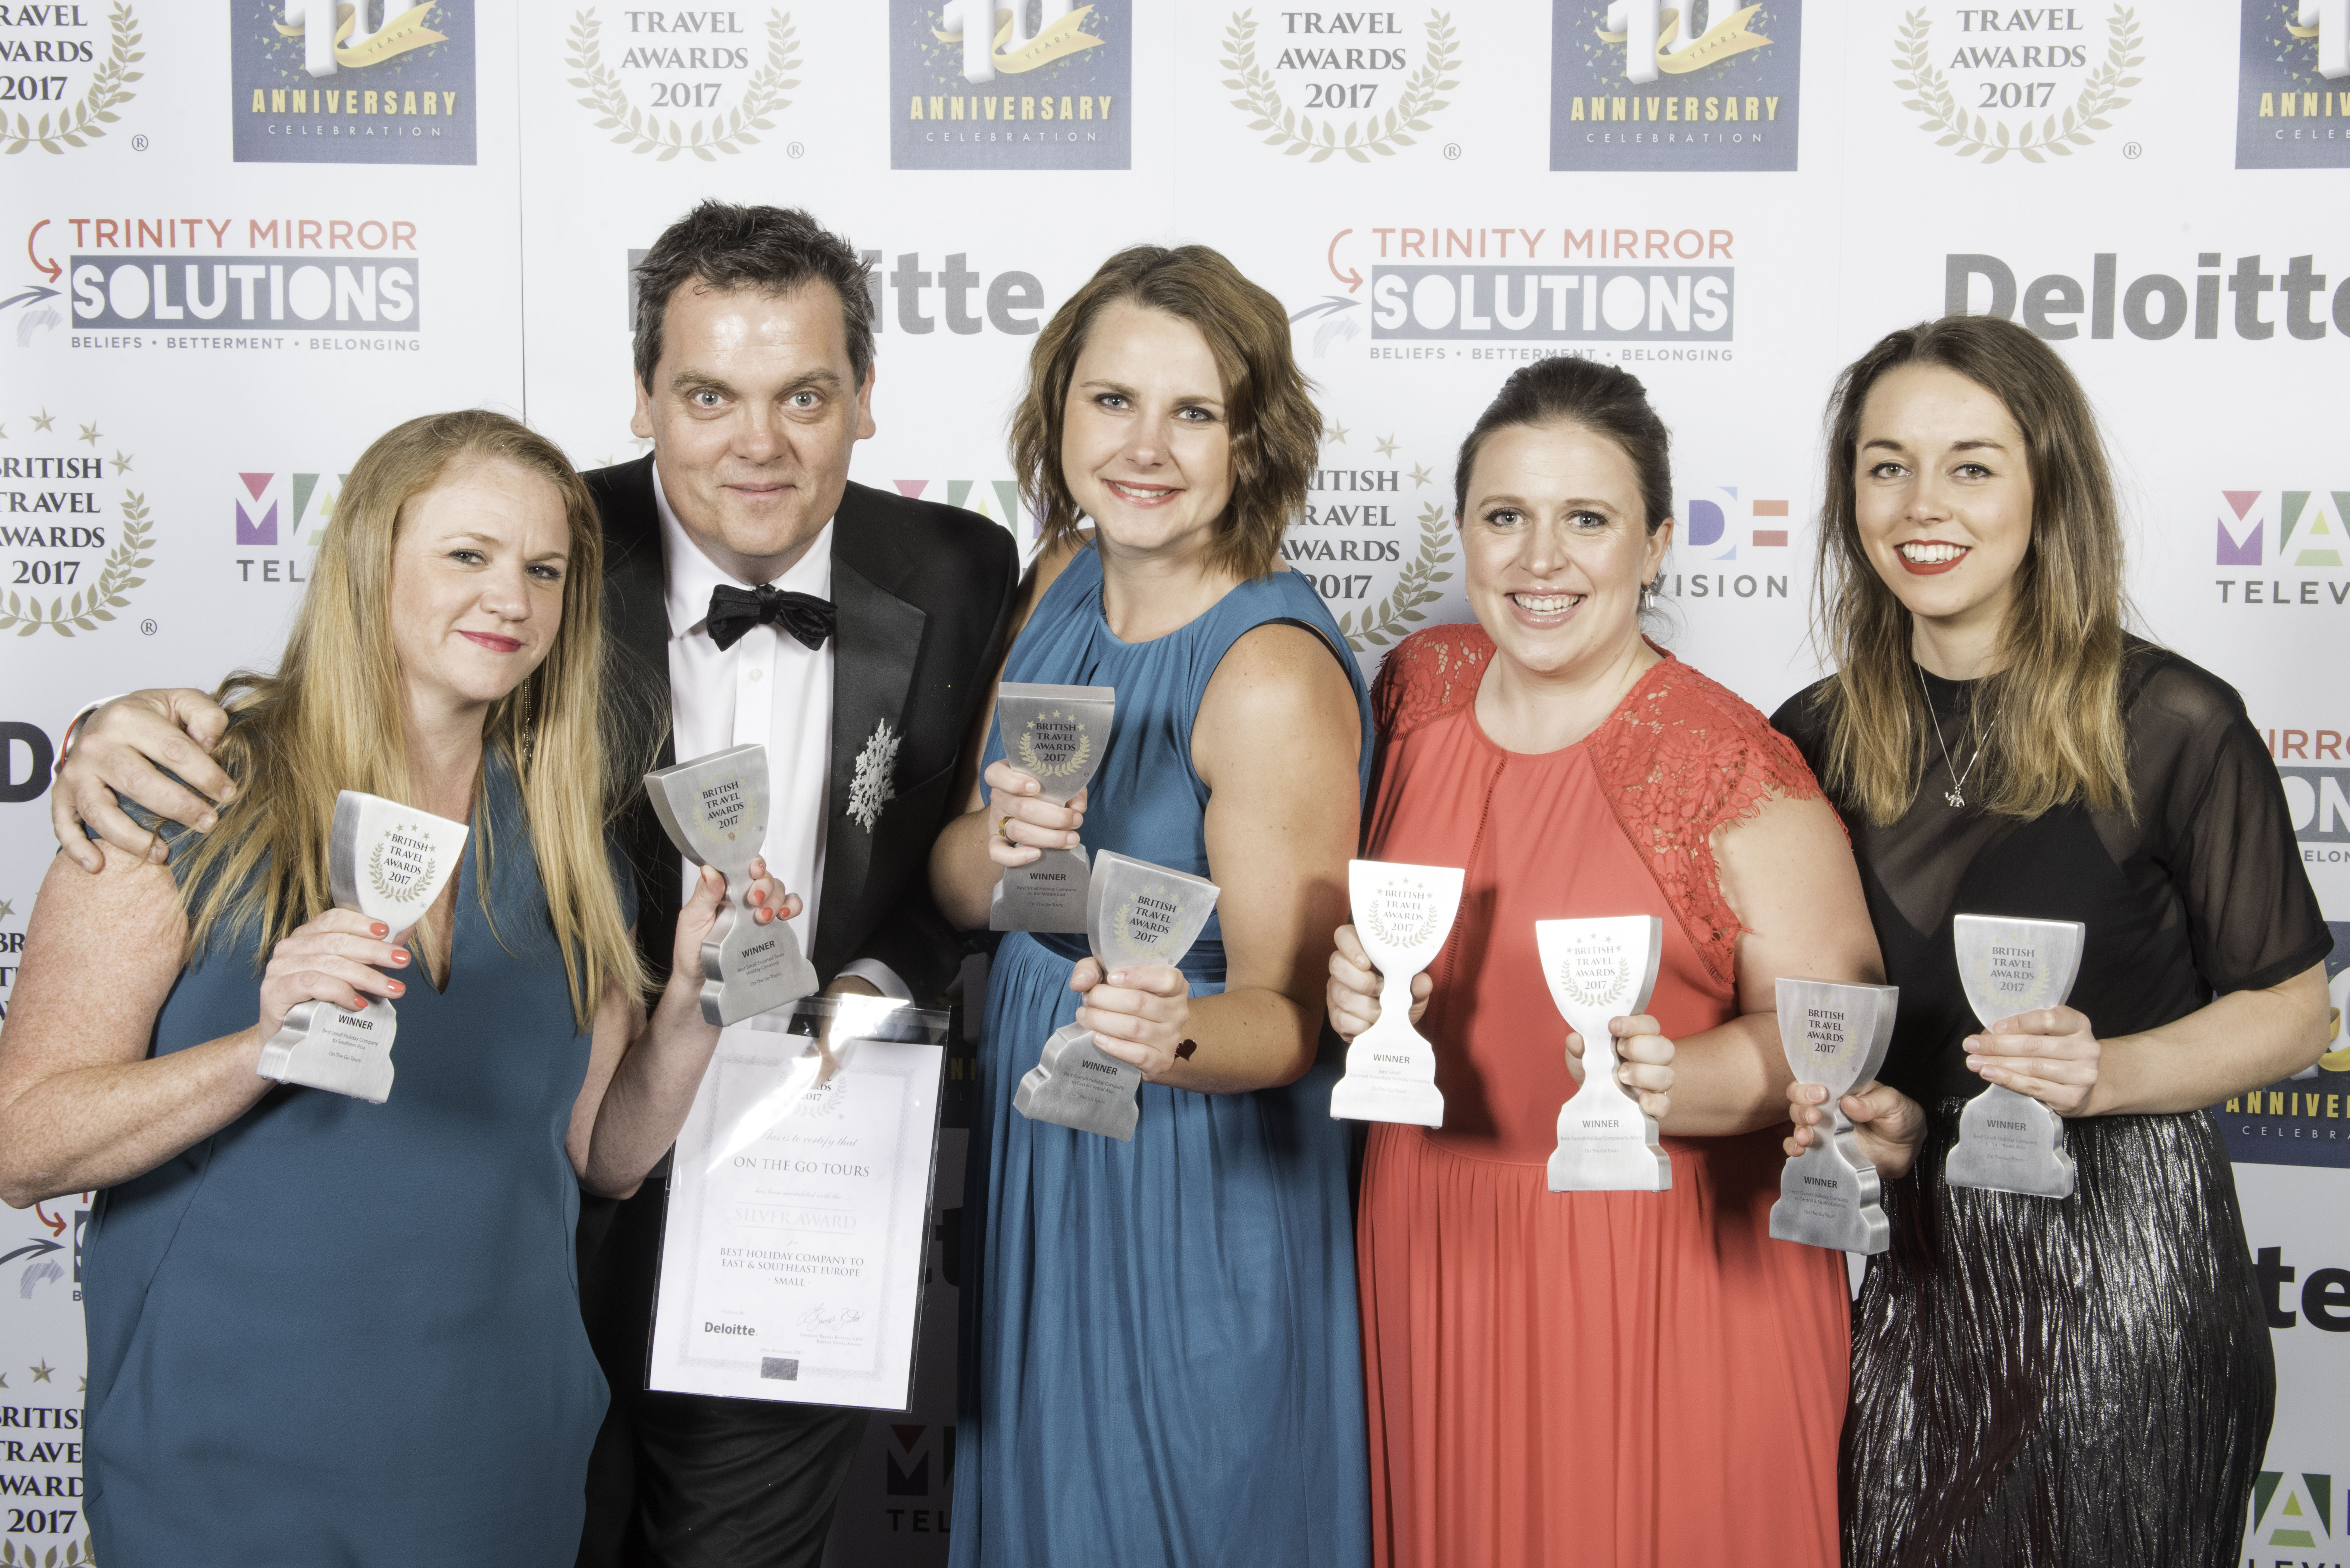 On the Go Tours British Travel Awards 2017. Photo by Steve Dunlop +447762084057 steve@stevedunlop.com